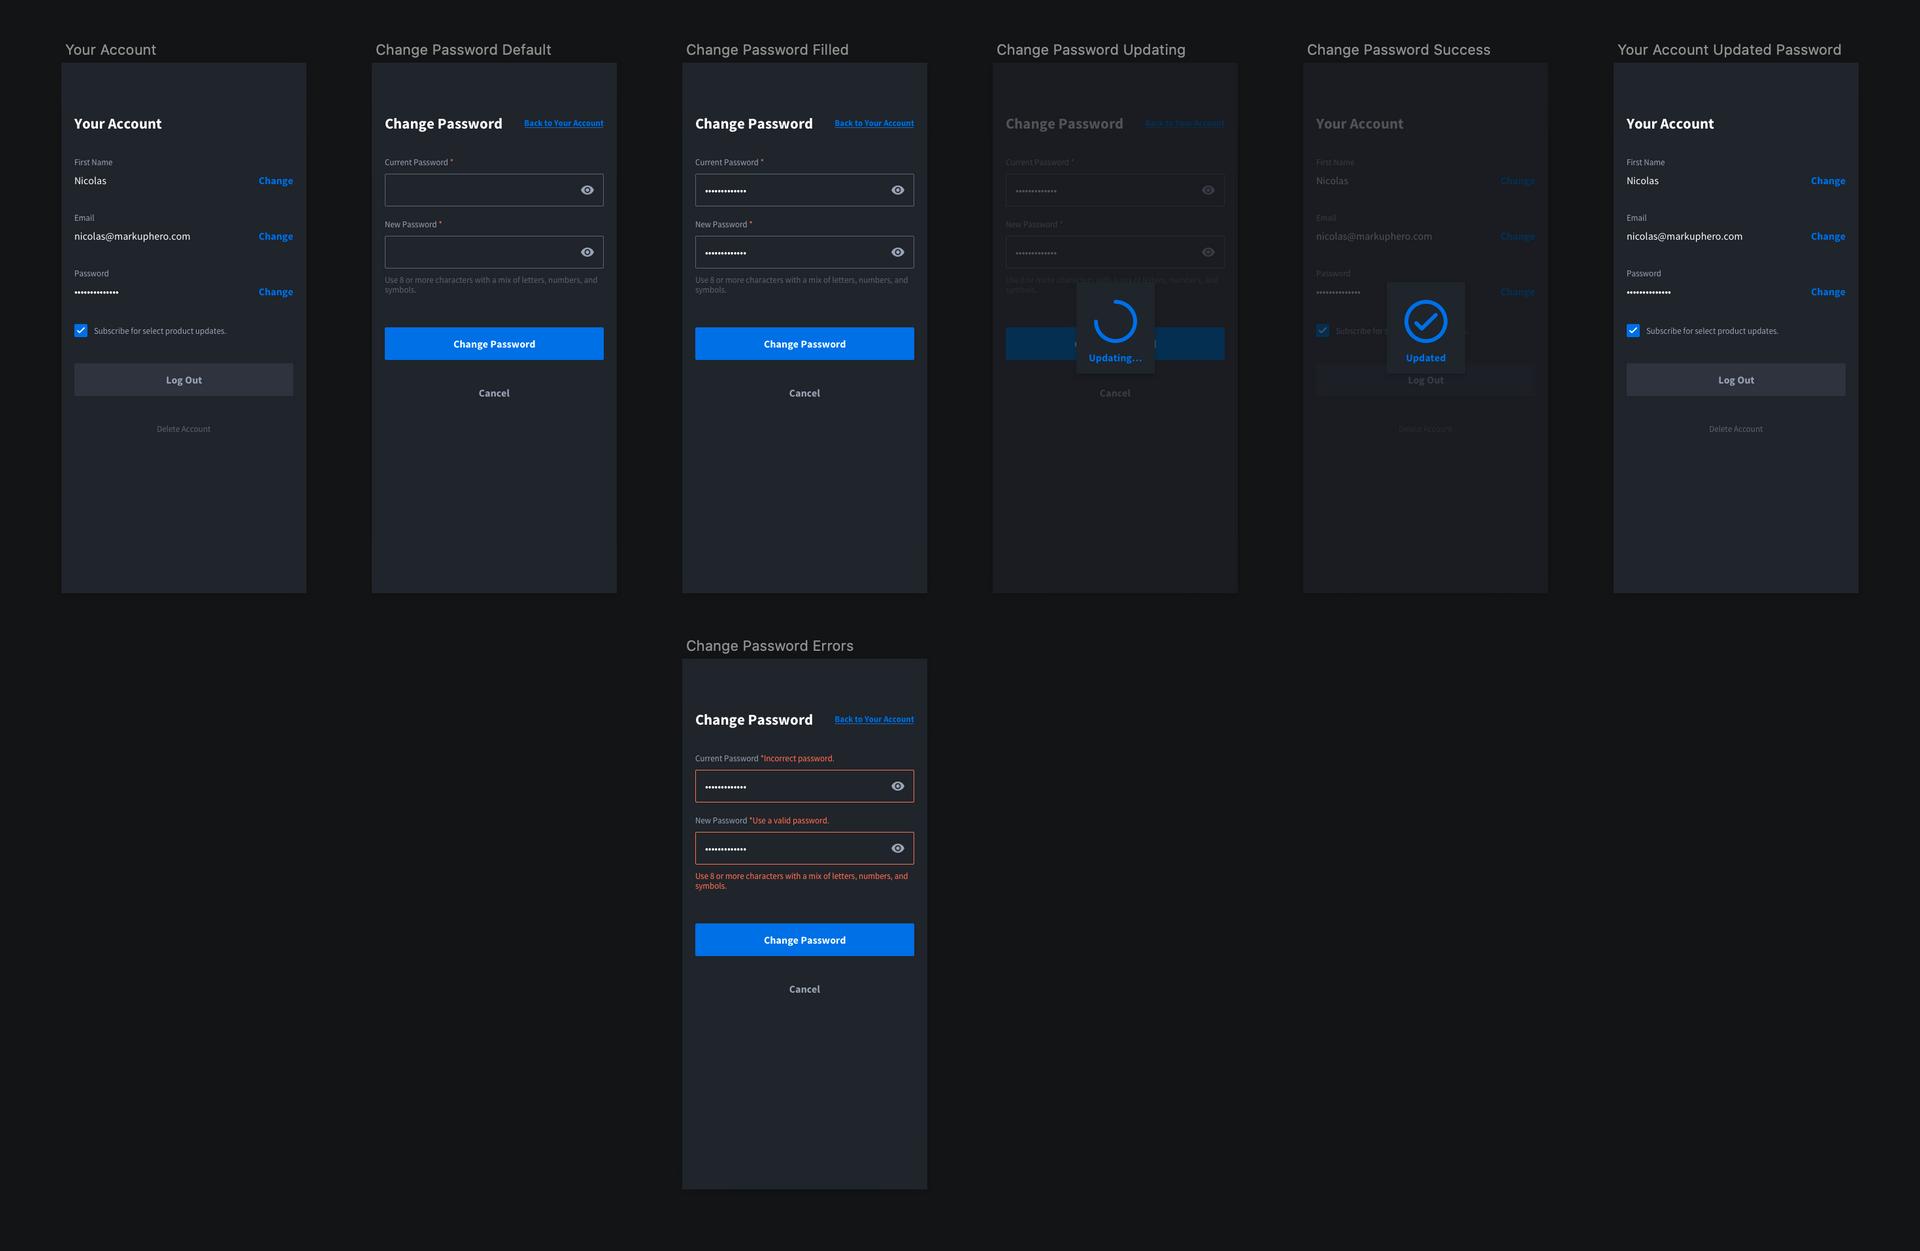 User management: change your password flow / design from Markup Hero